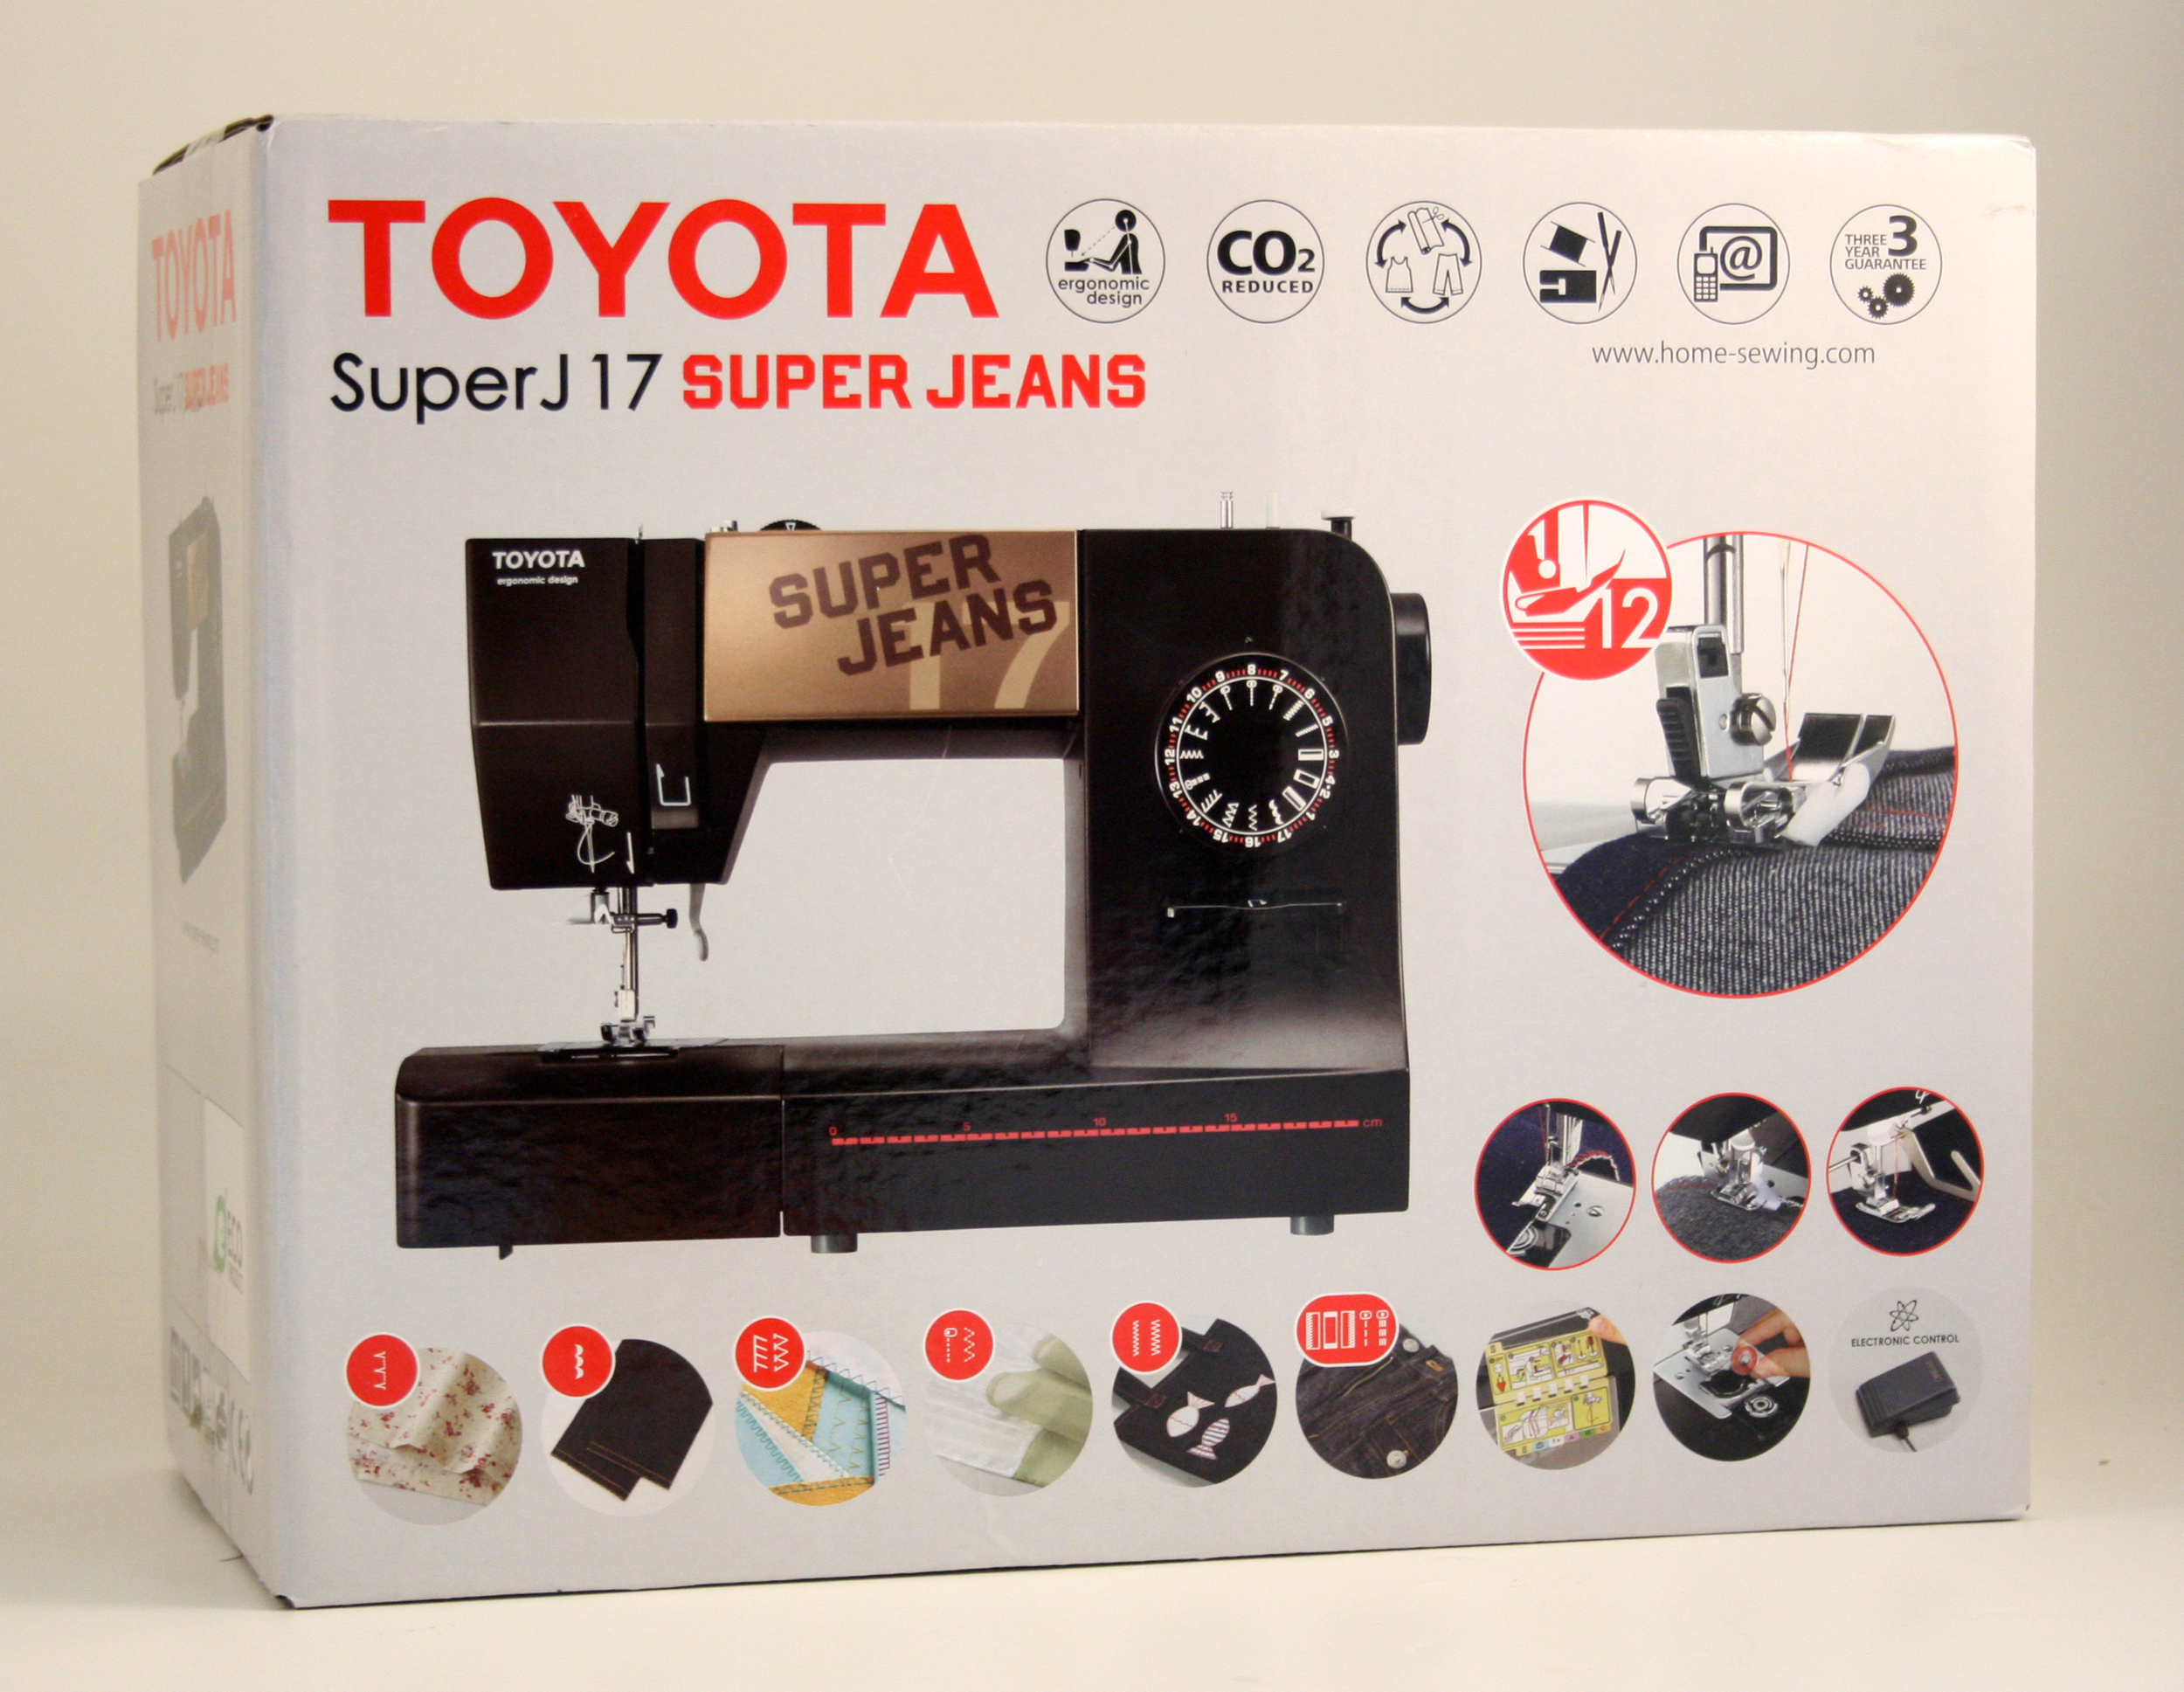 šicí stroj Toyota Super Jeans 17 černý-2